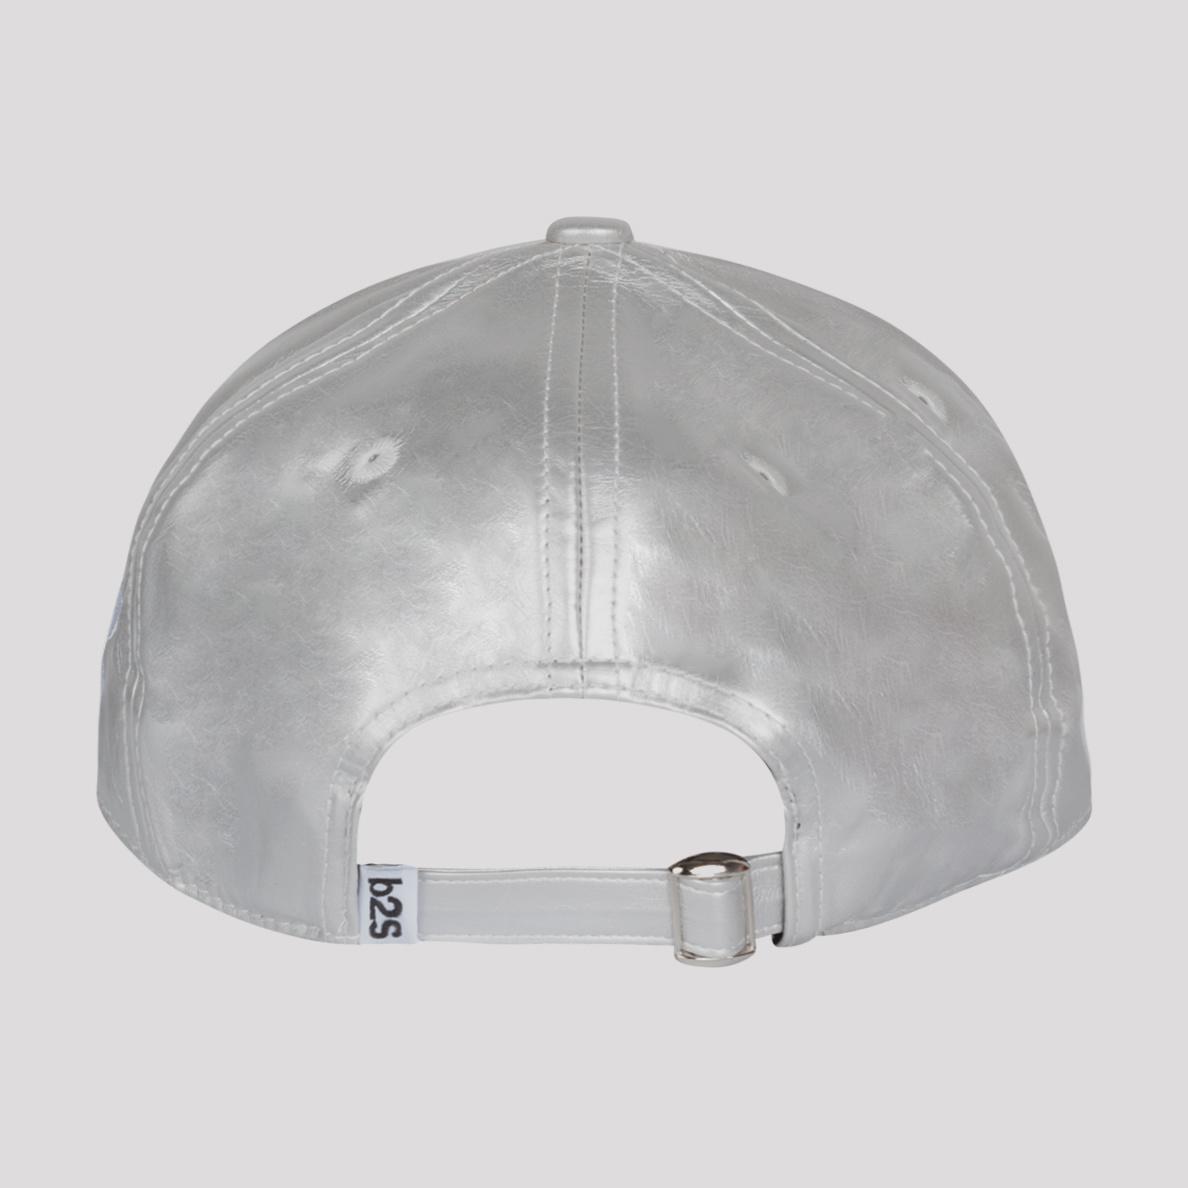 PUSSY LOUNGE BASEBALL CAP METALLIC SILVER